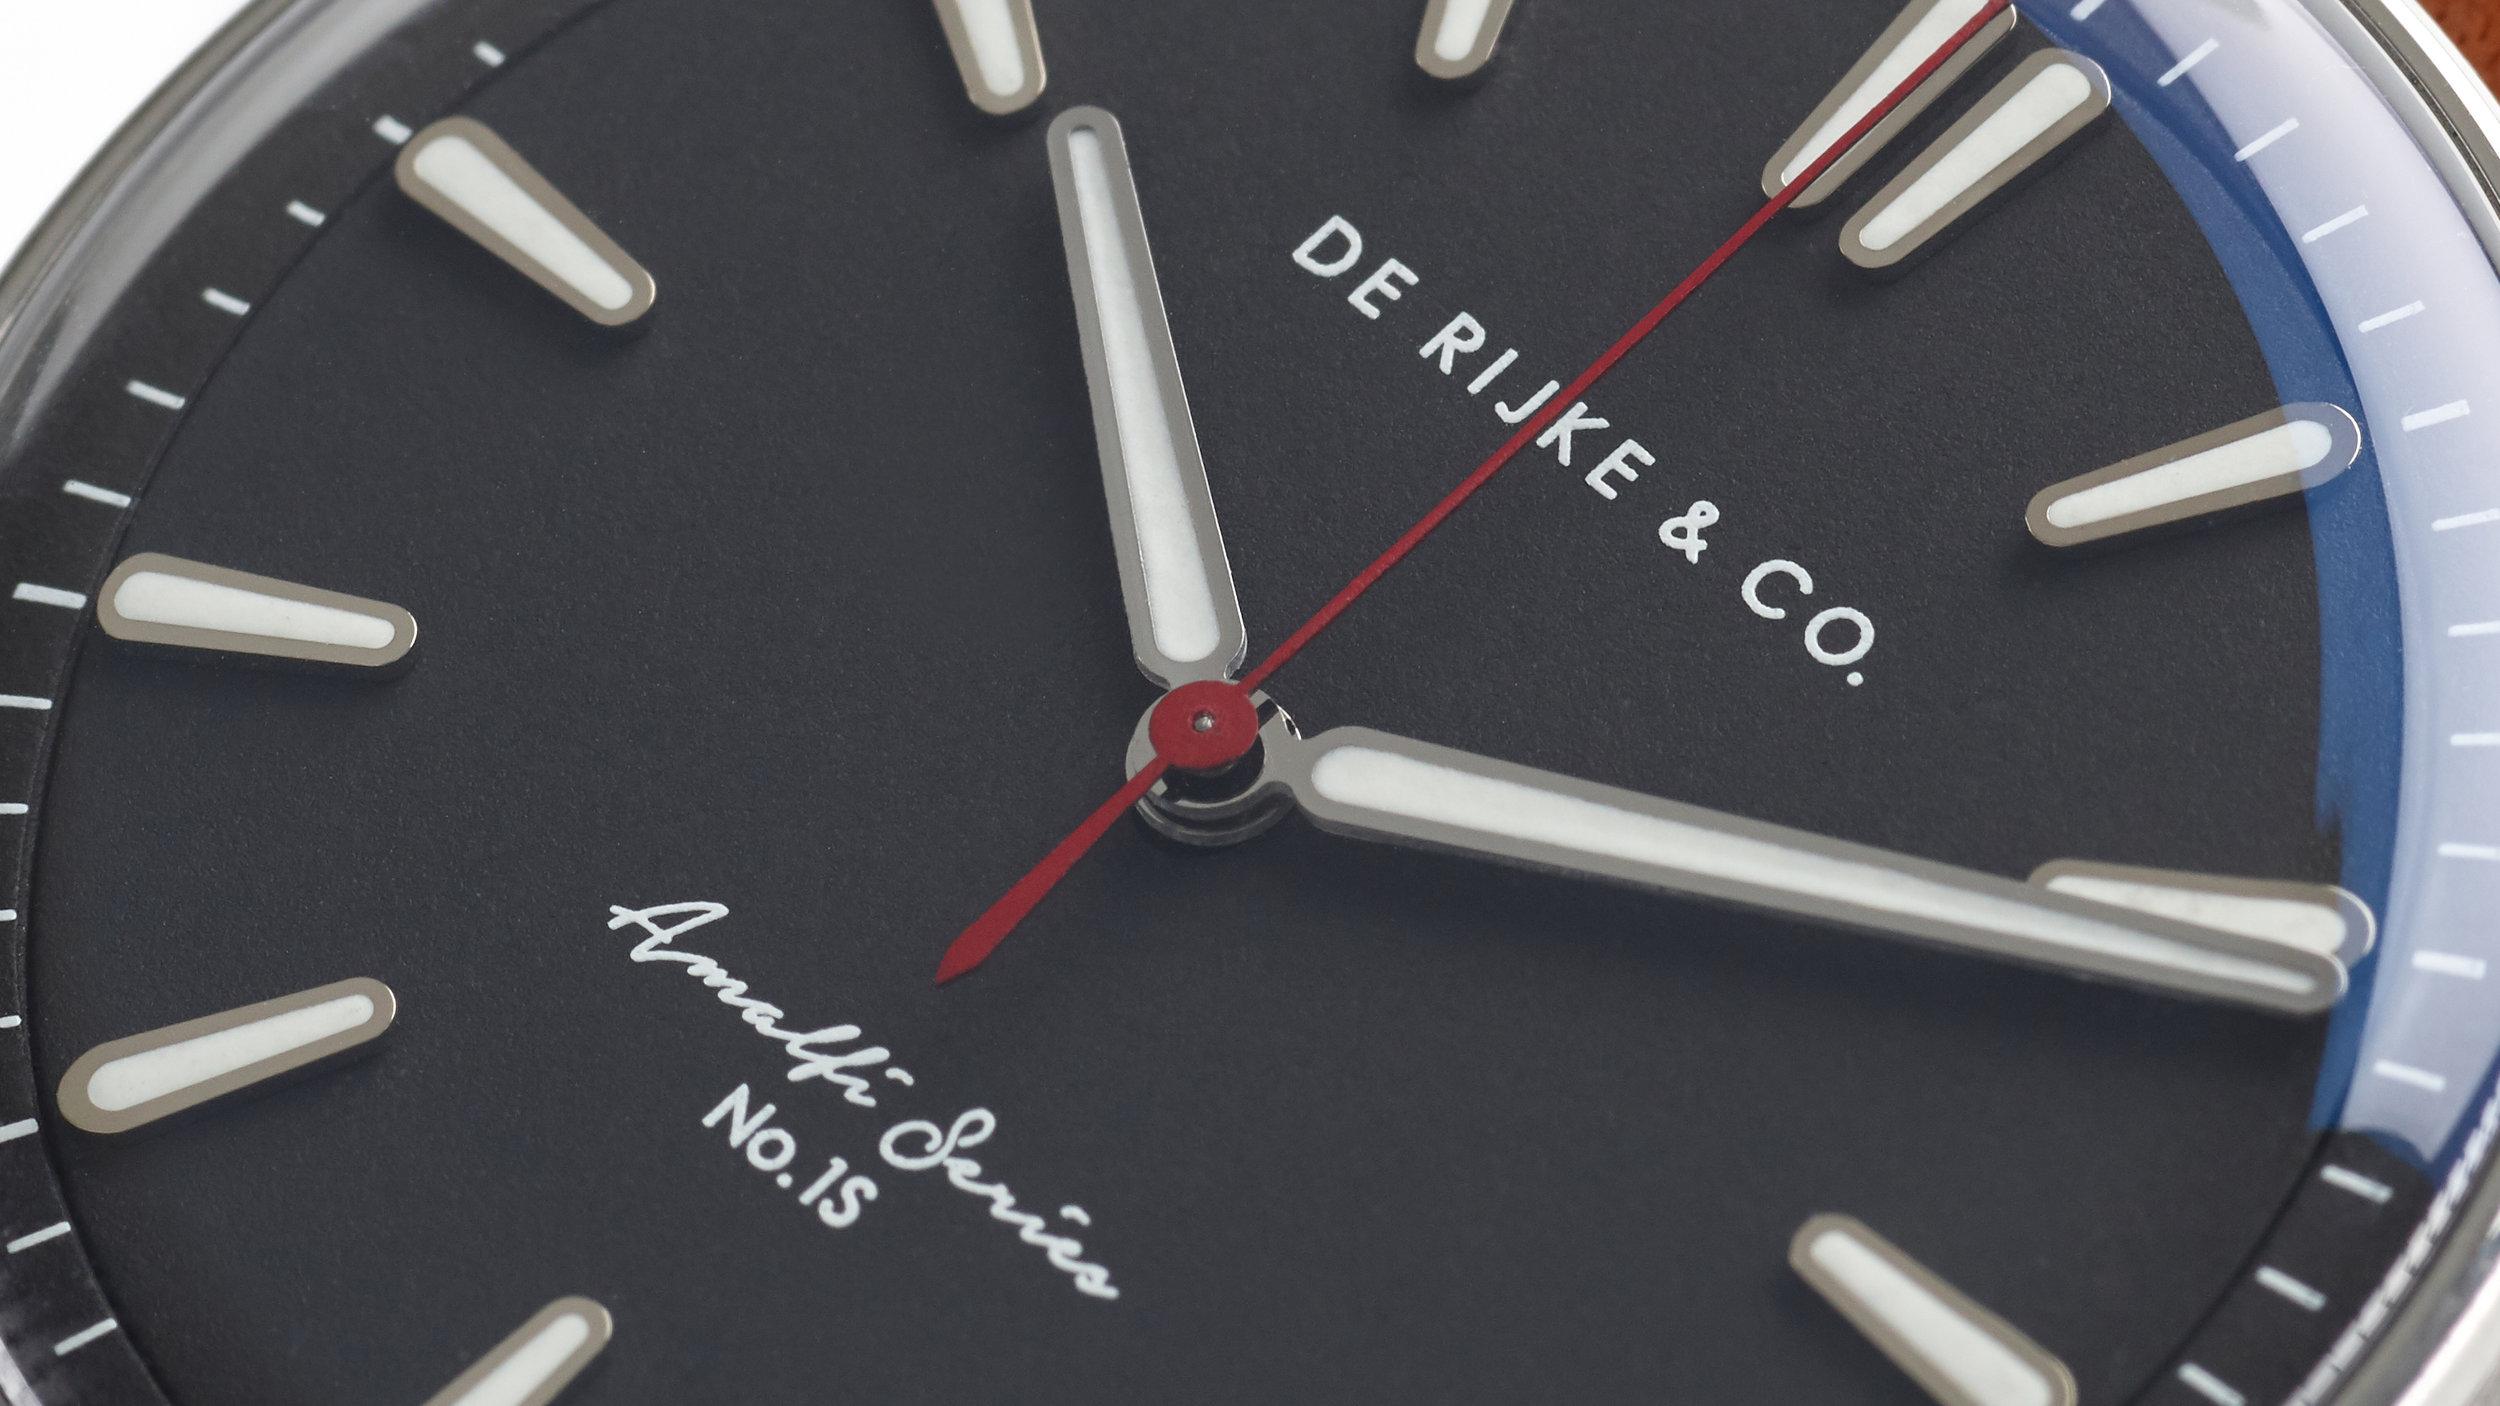 YM_De Rijke & Co Watches_Amalfi1S-Lume_006 crop.jpg